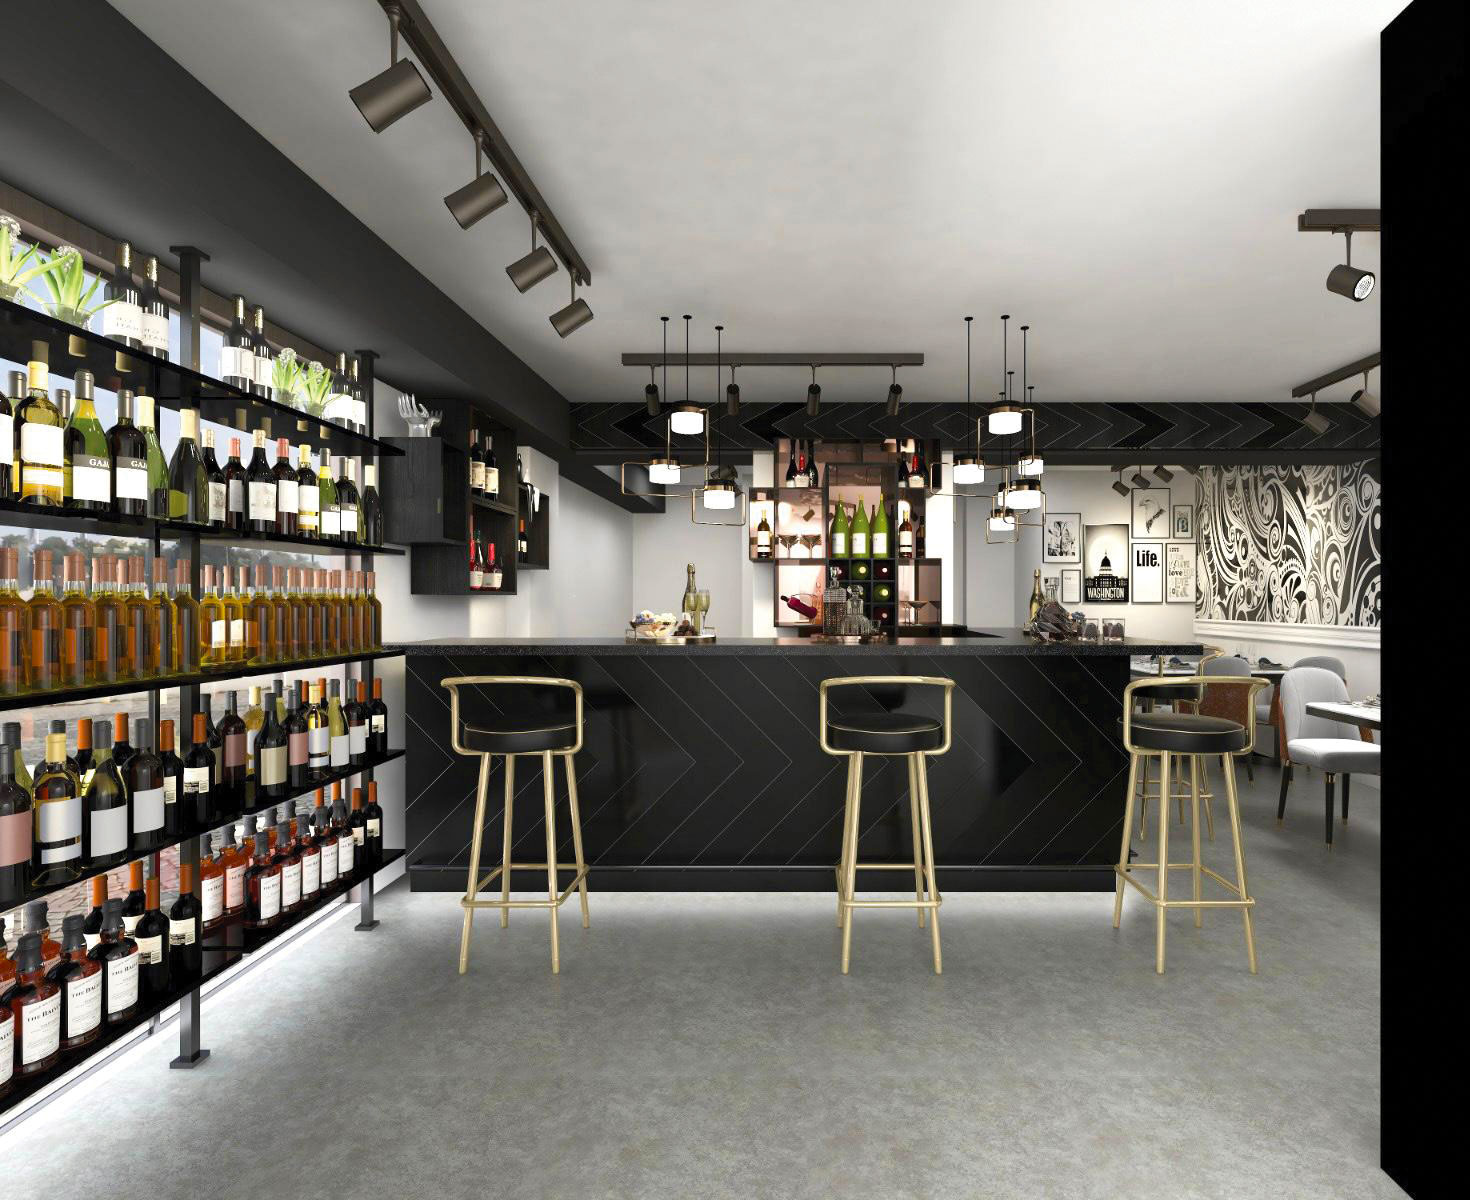 hip bar and restaurant, wines and spirits bar counter